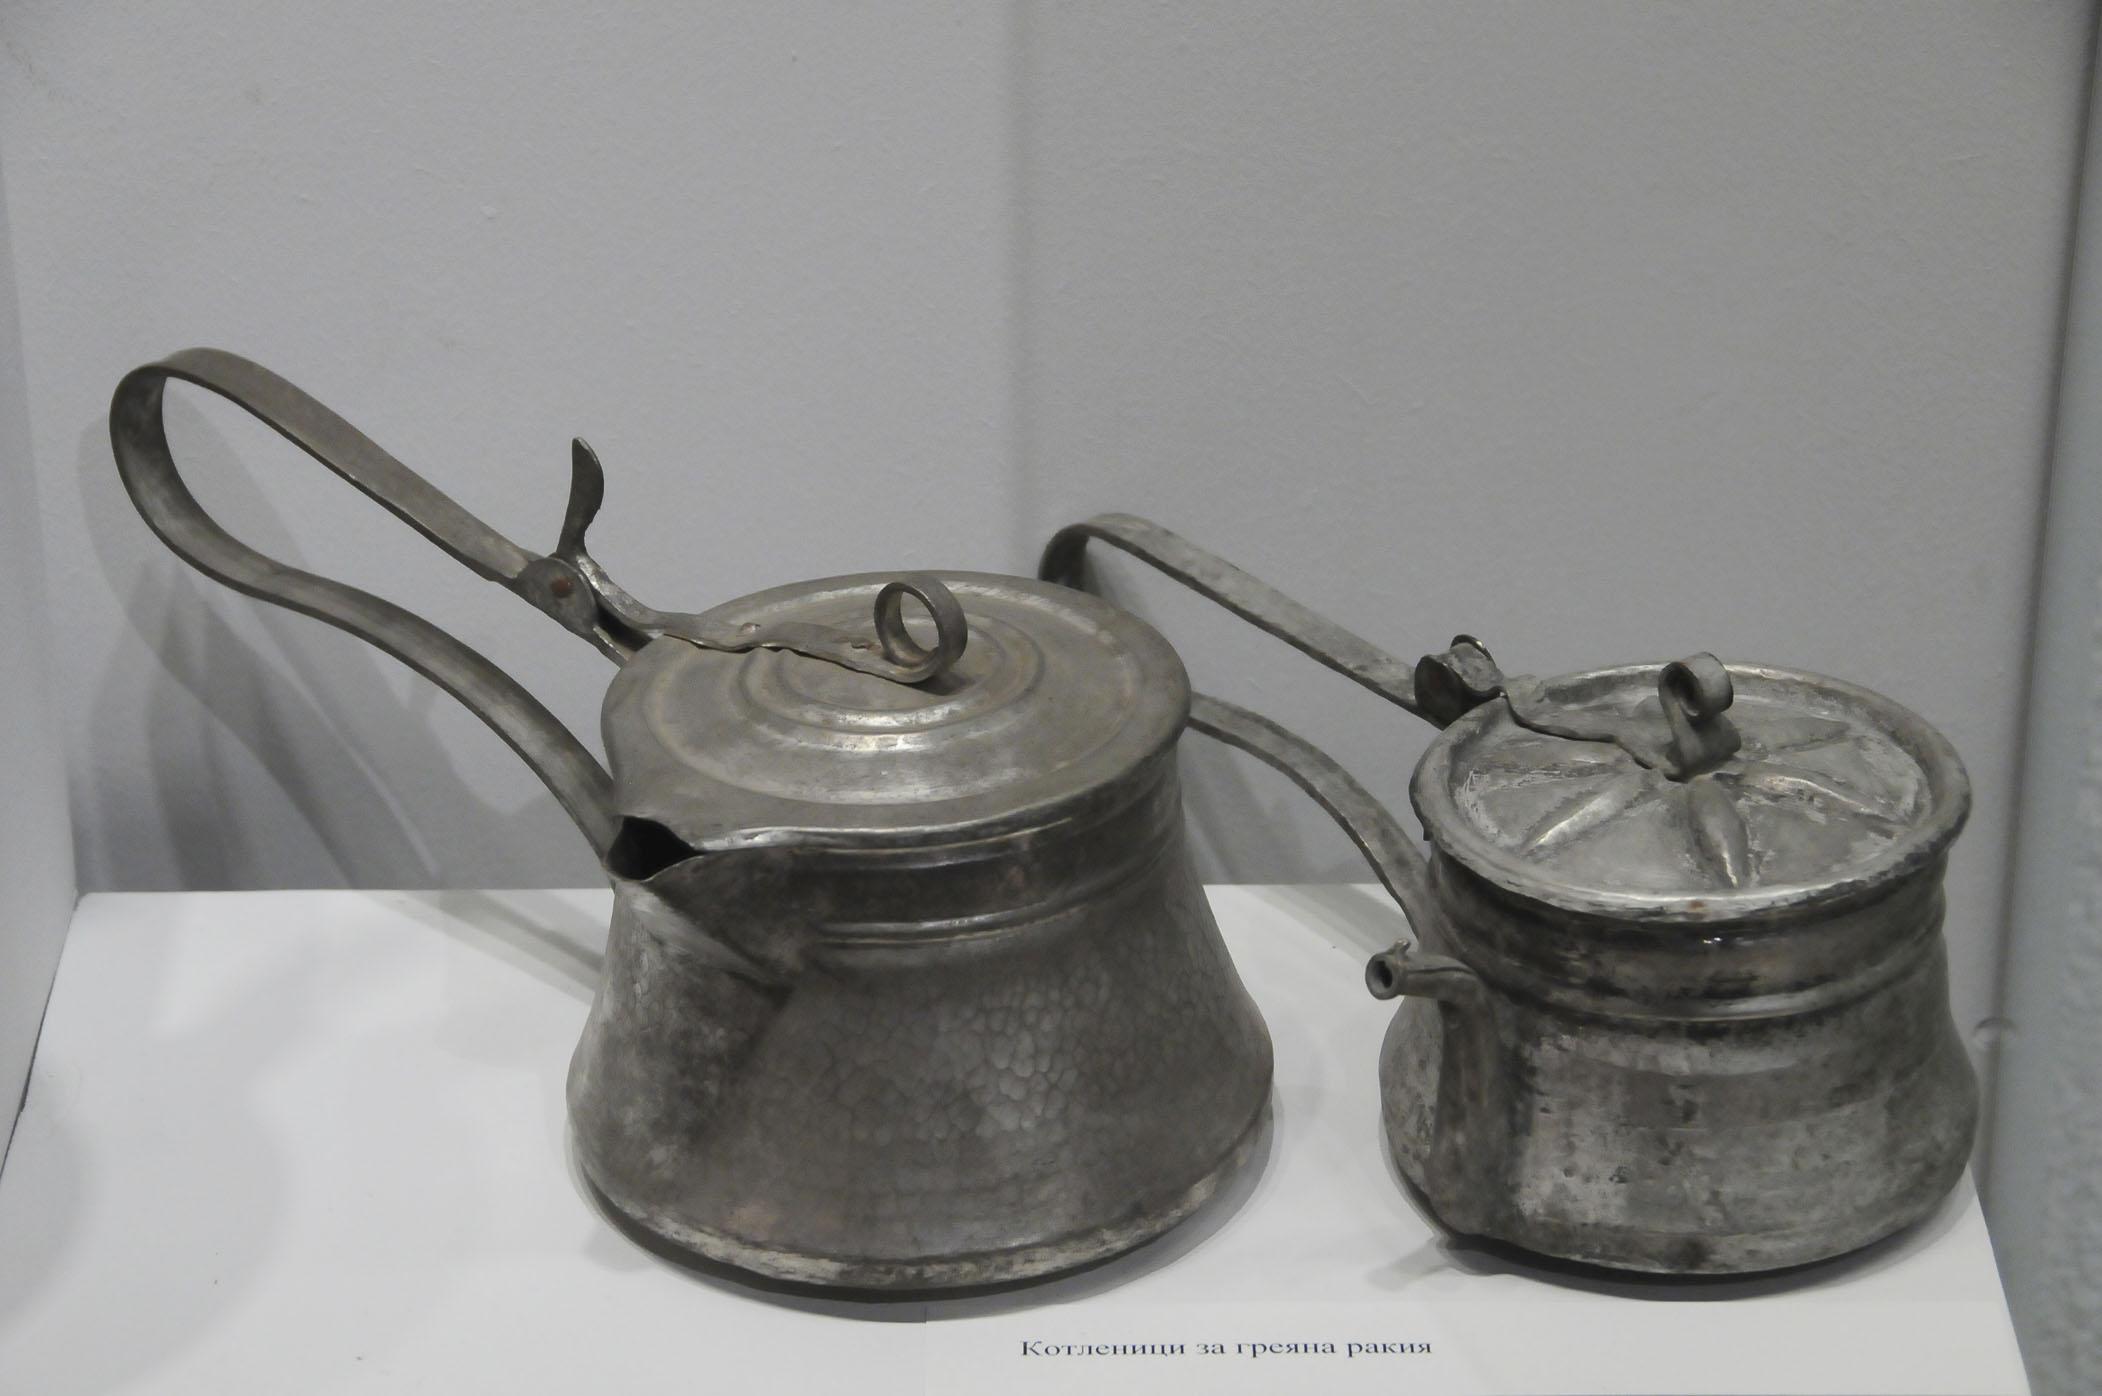 troyan-museum-mednikarstvo-ot-troyanskiq-krai-19